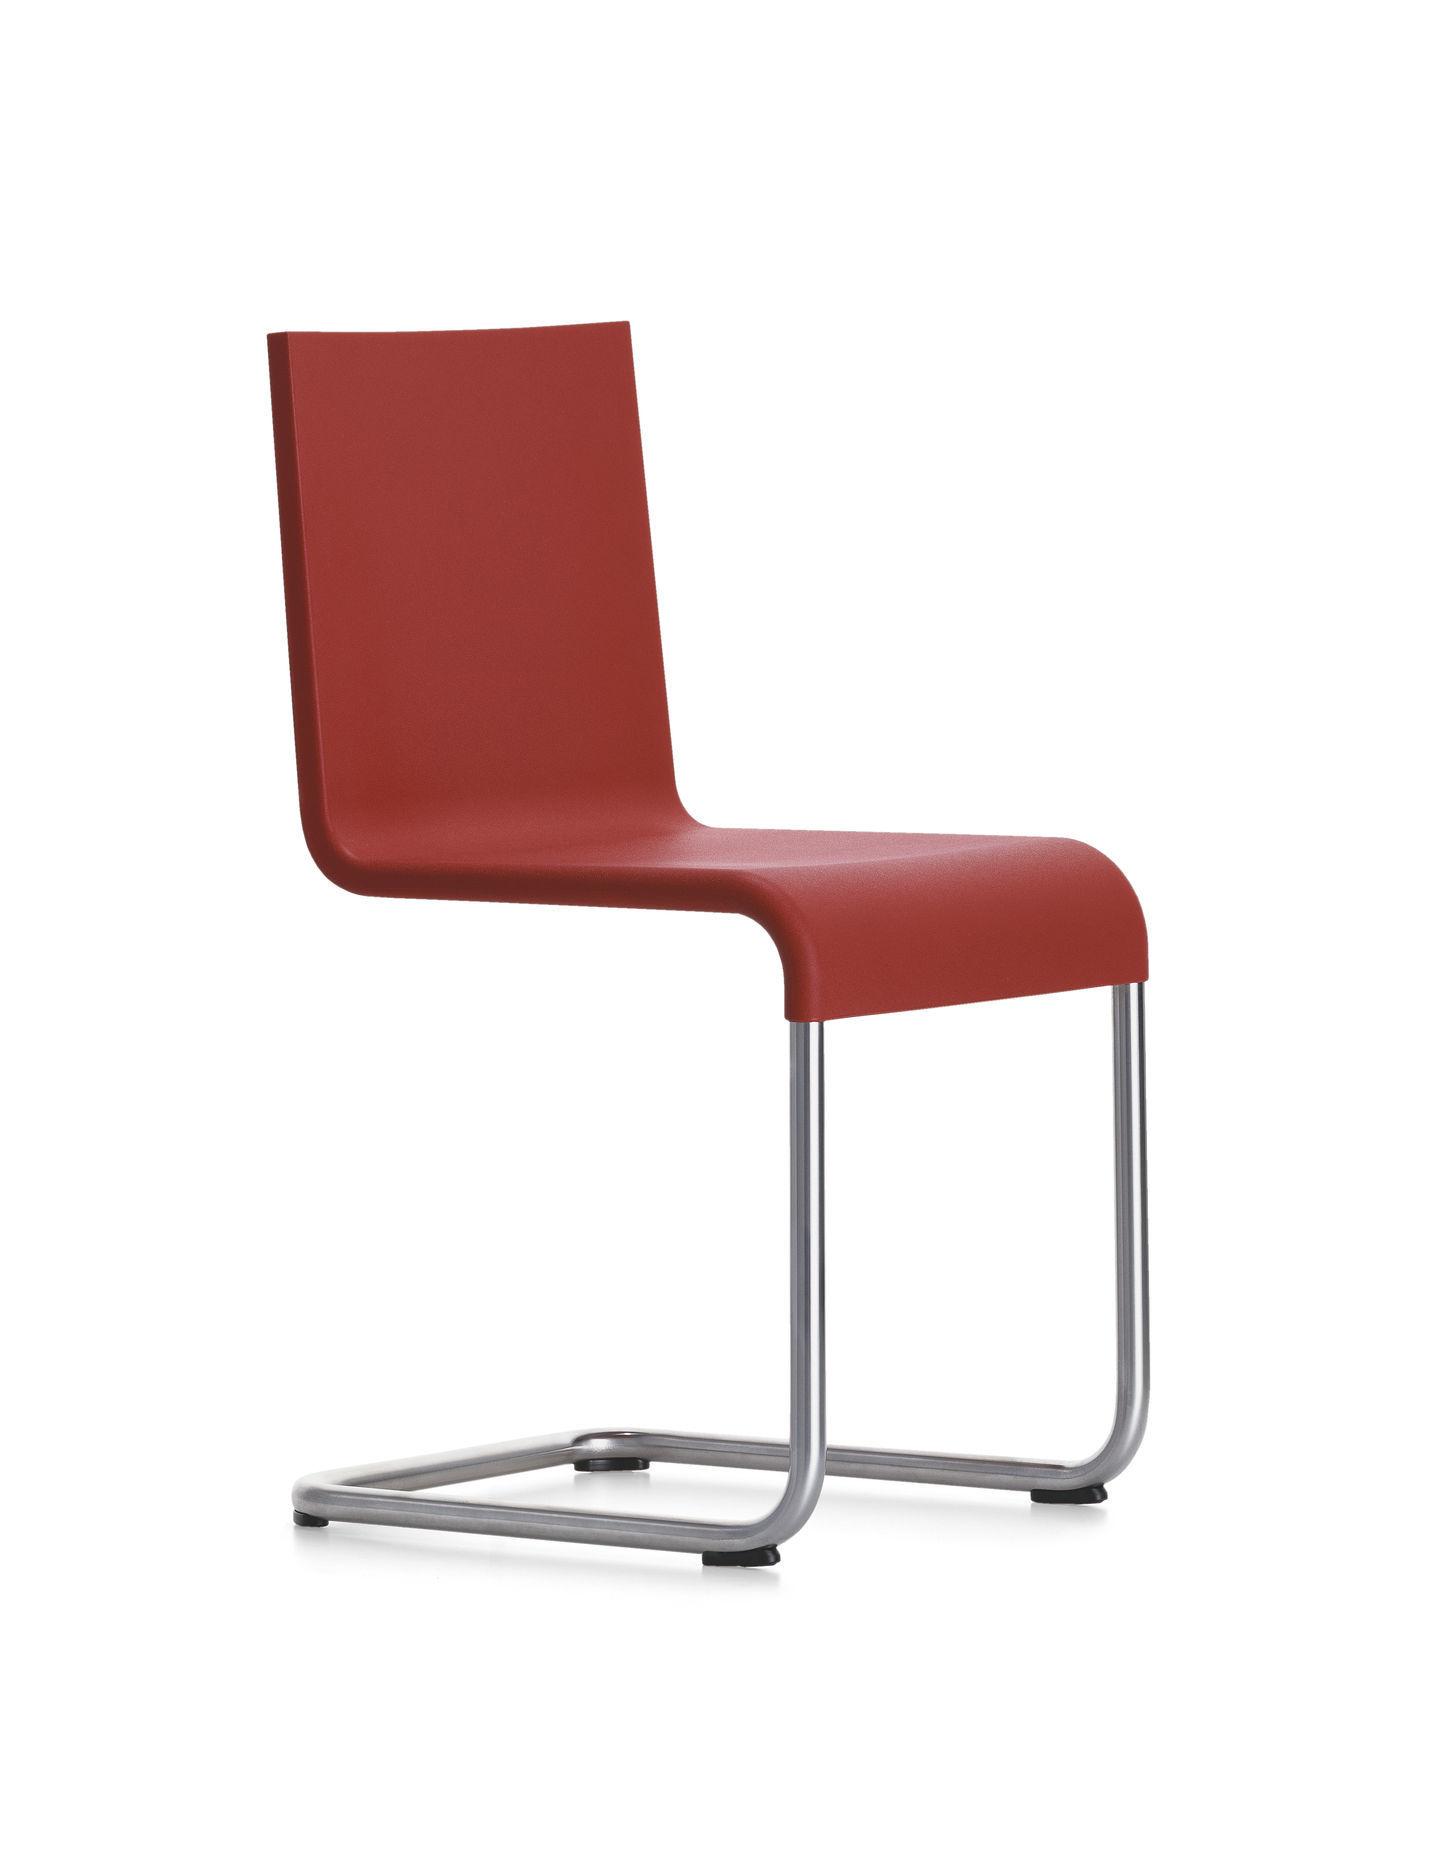 .05 Stuhl stapelbar Vitra